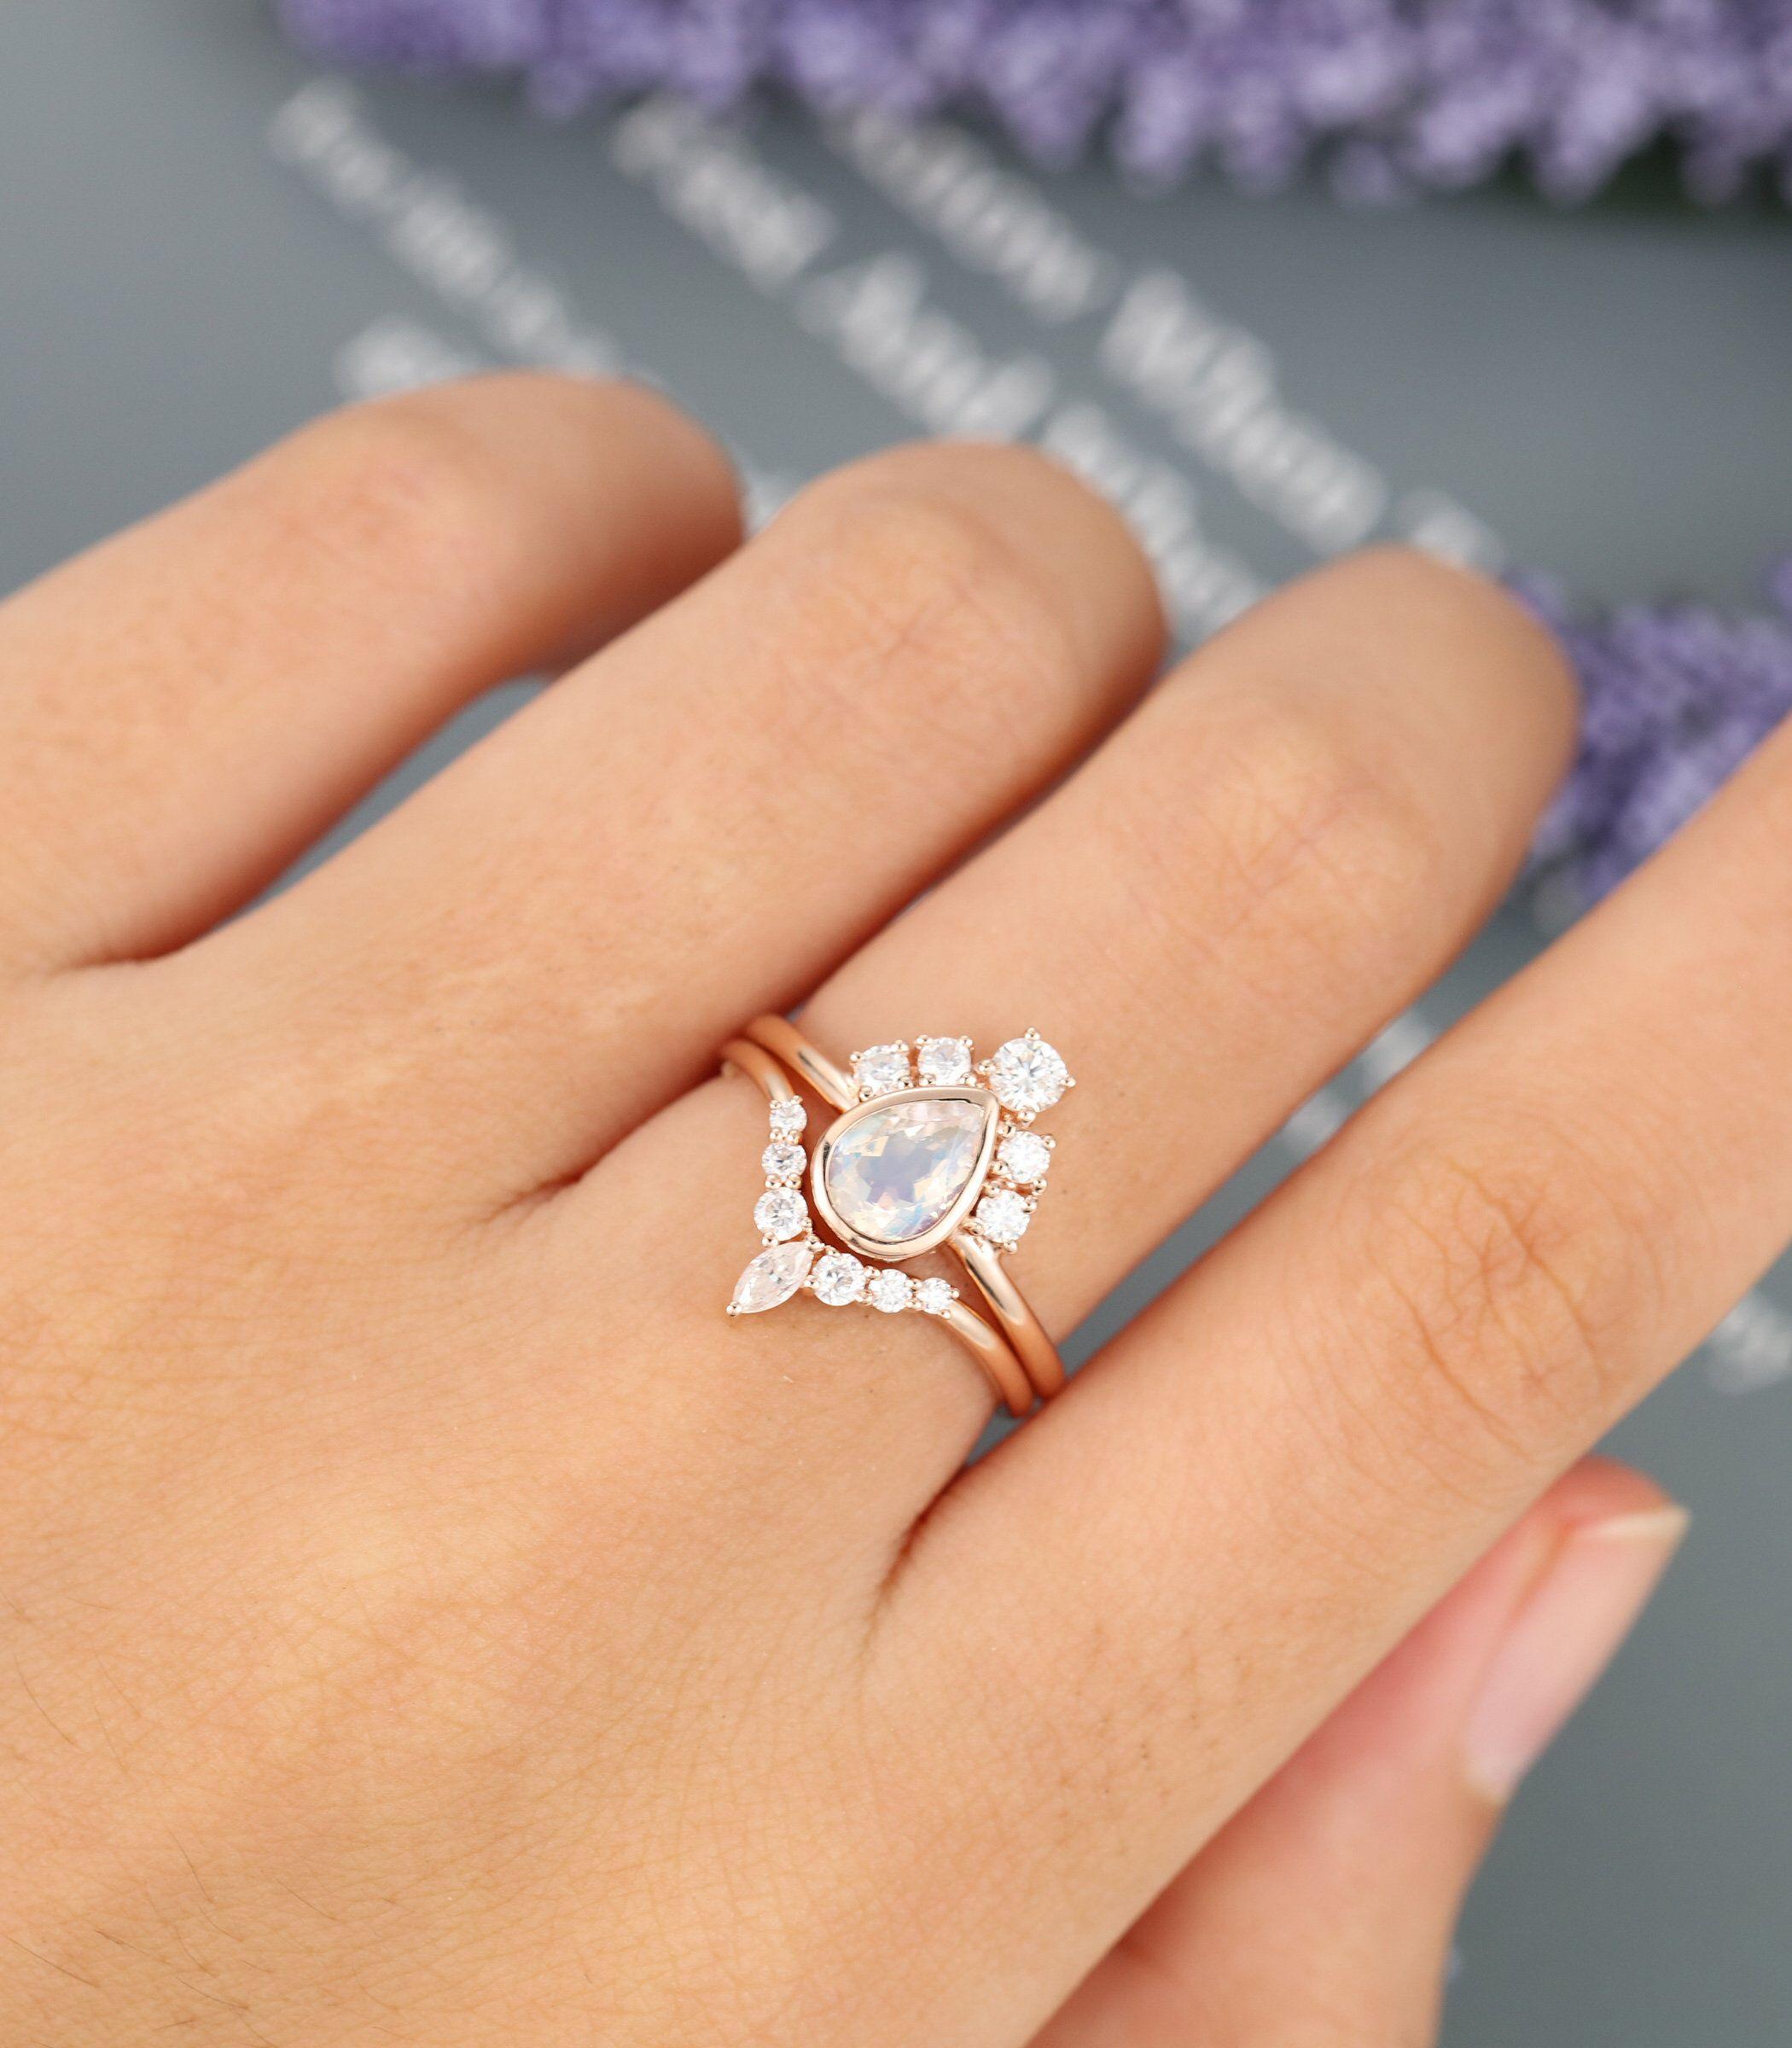 Pear shaped Moonstone engagement ring set Unique rose gold